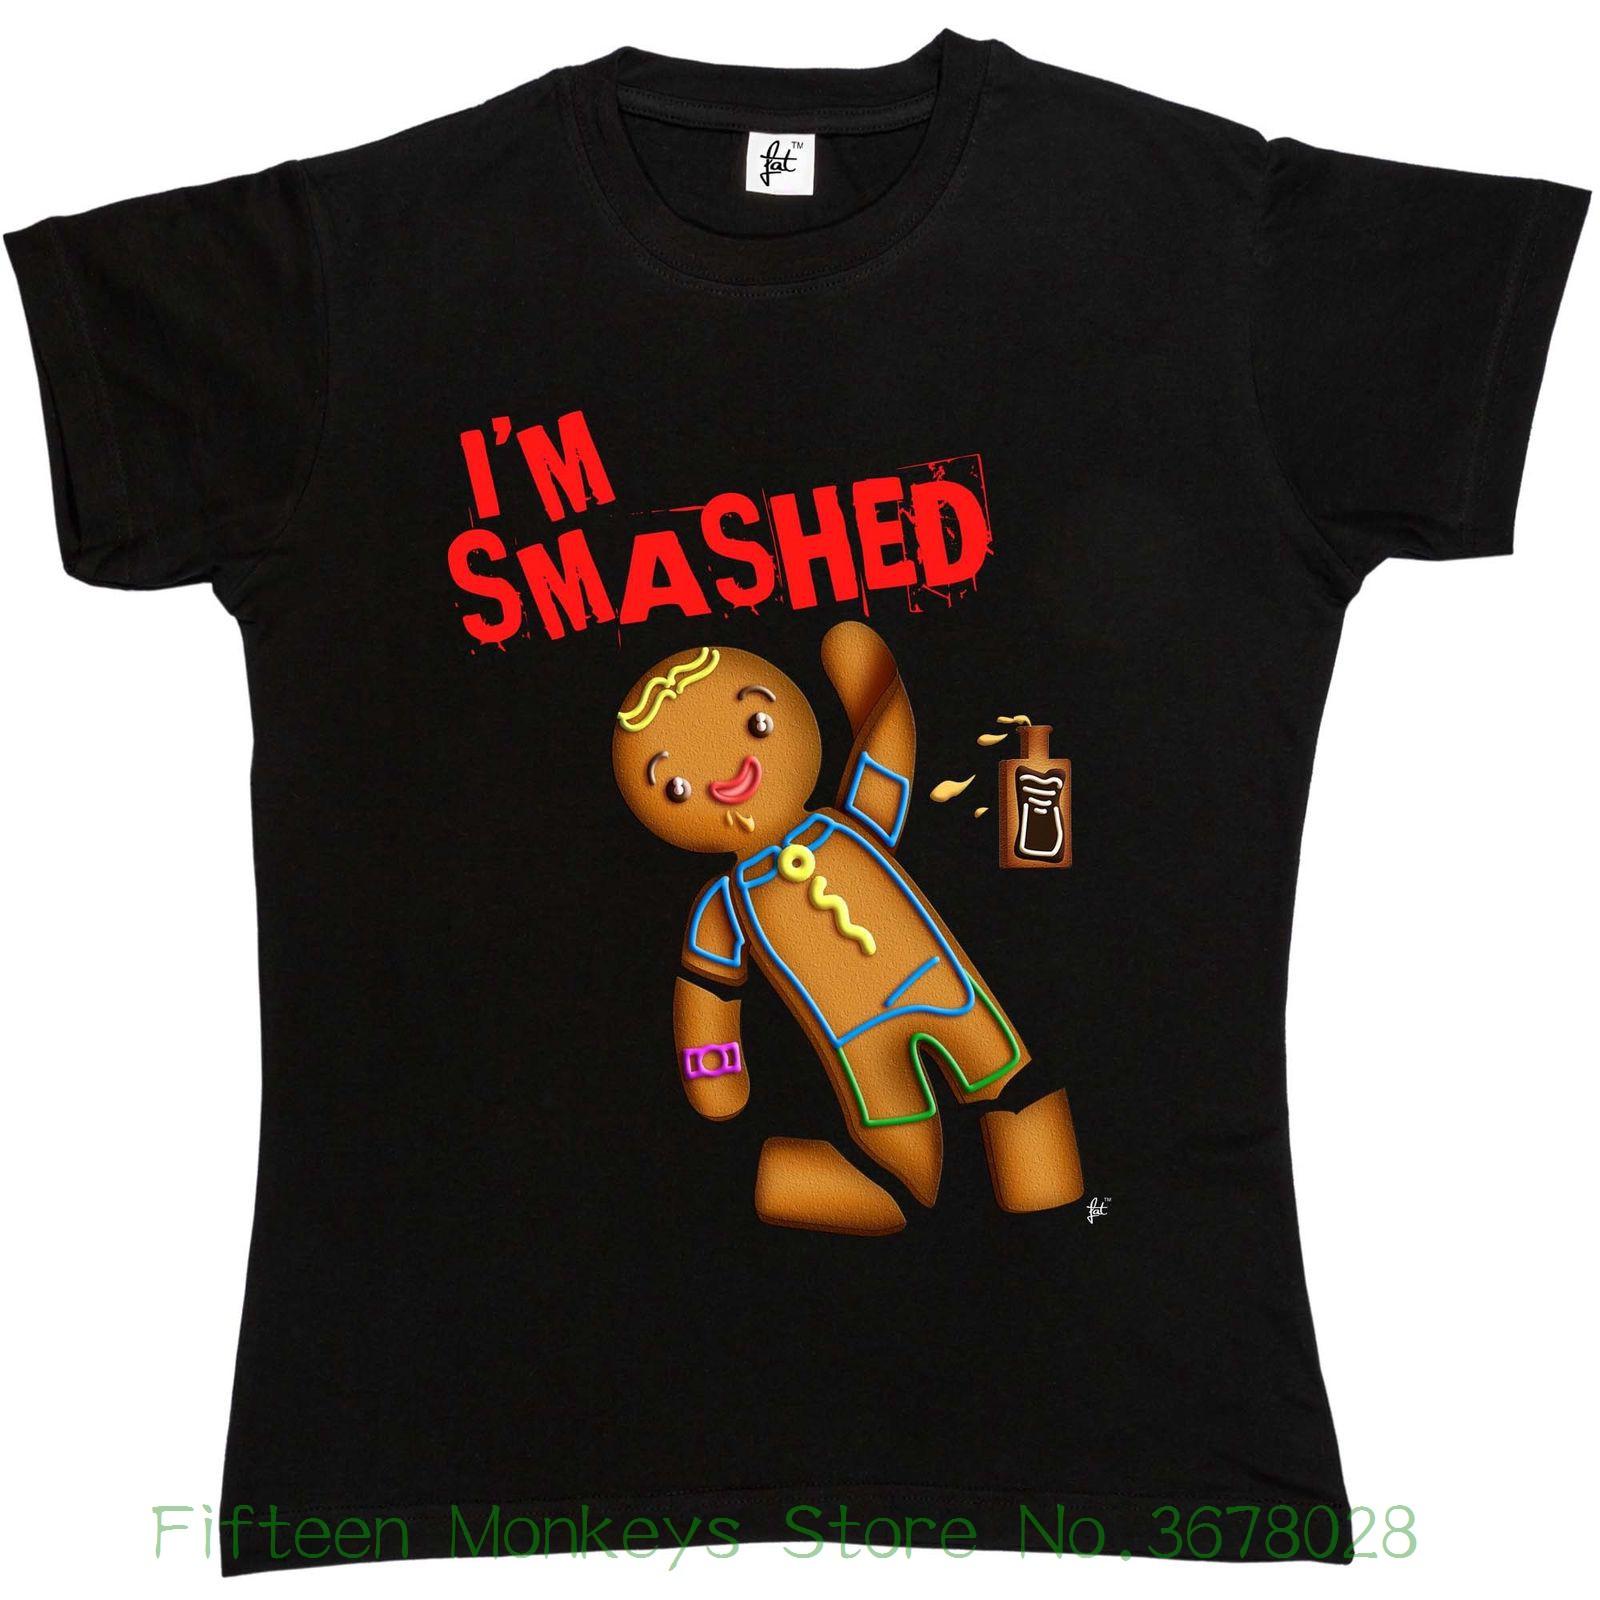 Princess Leia Rebel David Bowie lady/'s tunic damen top shirt loose fit t-shirt